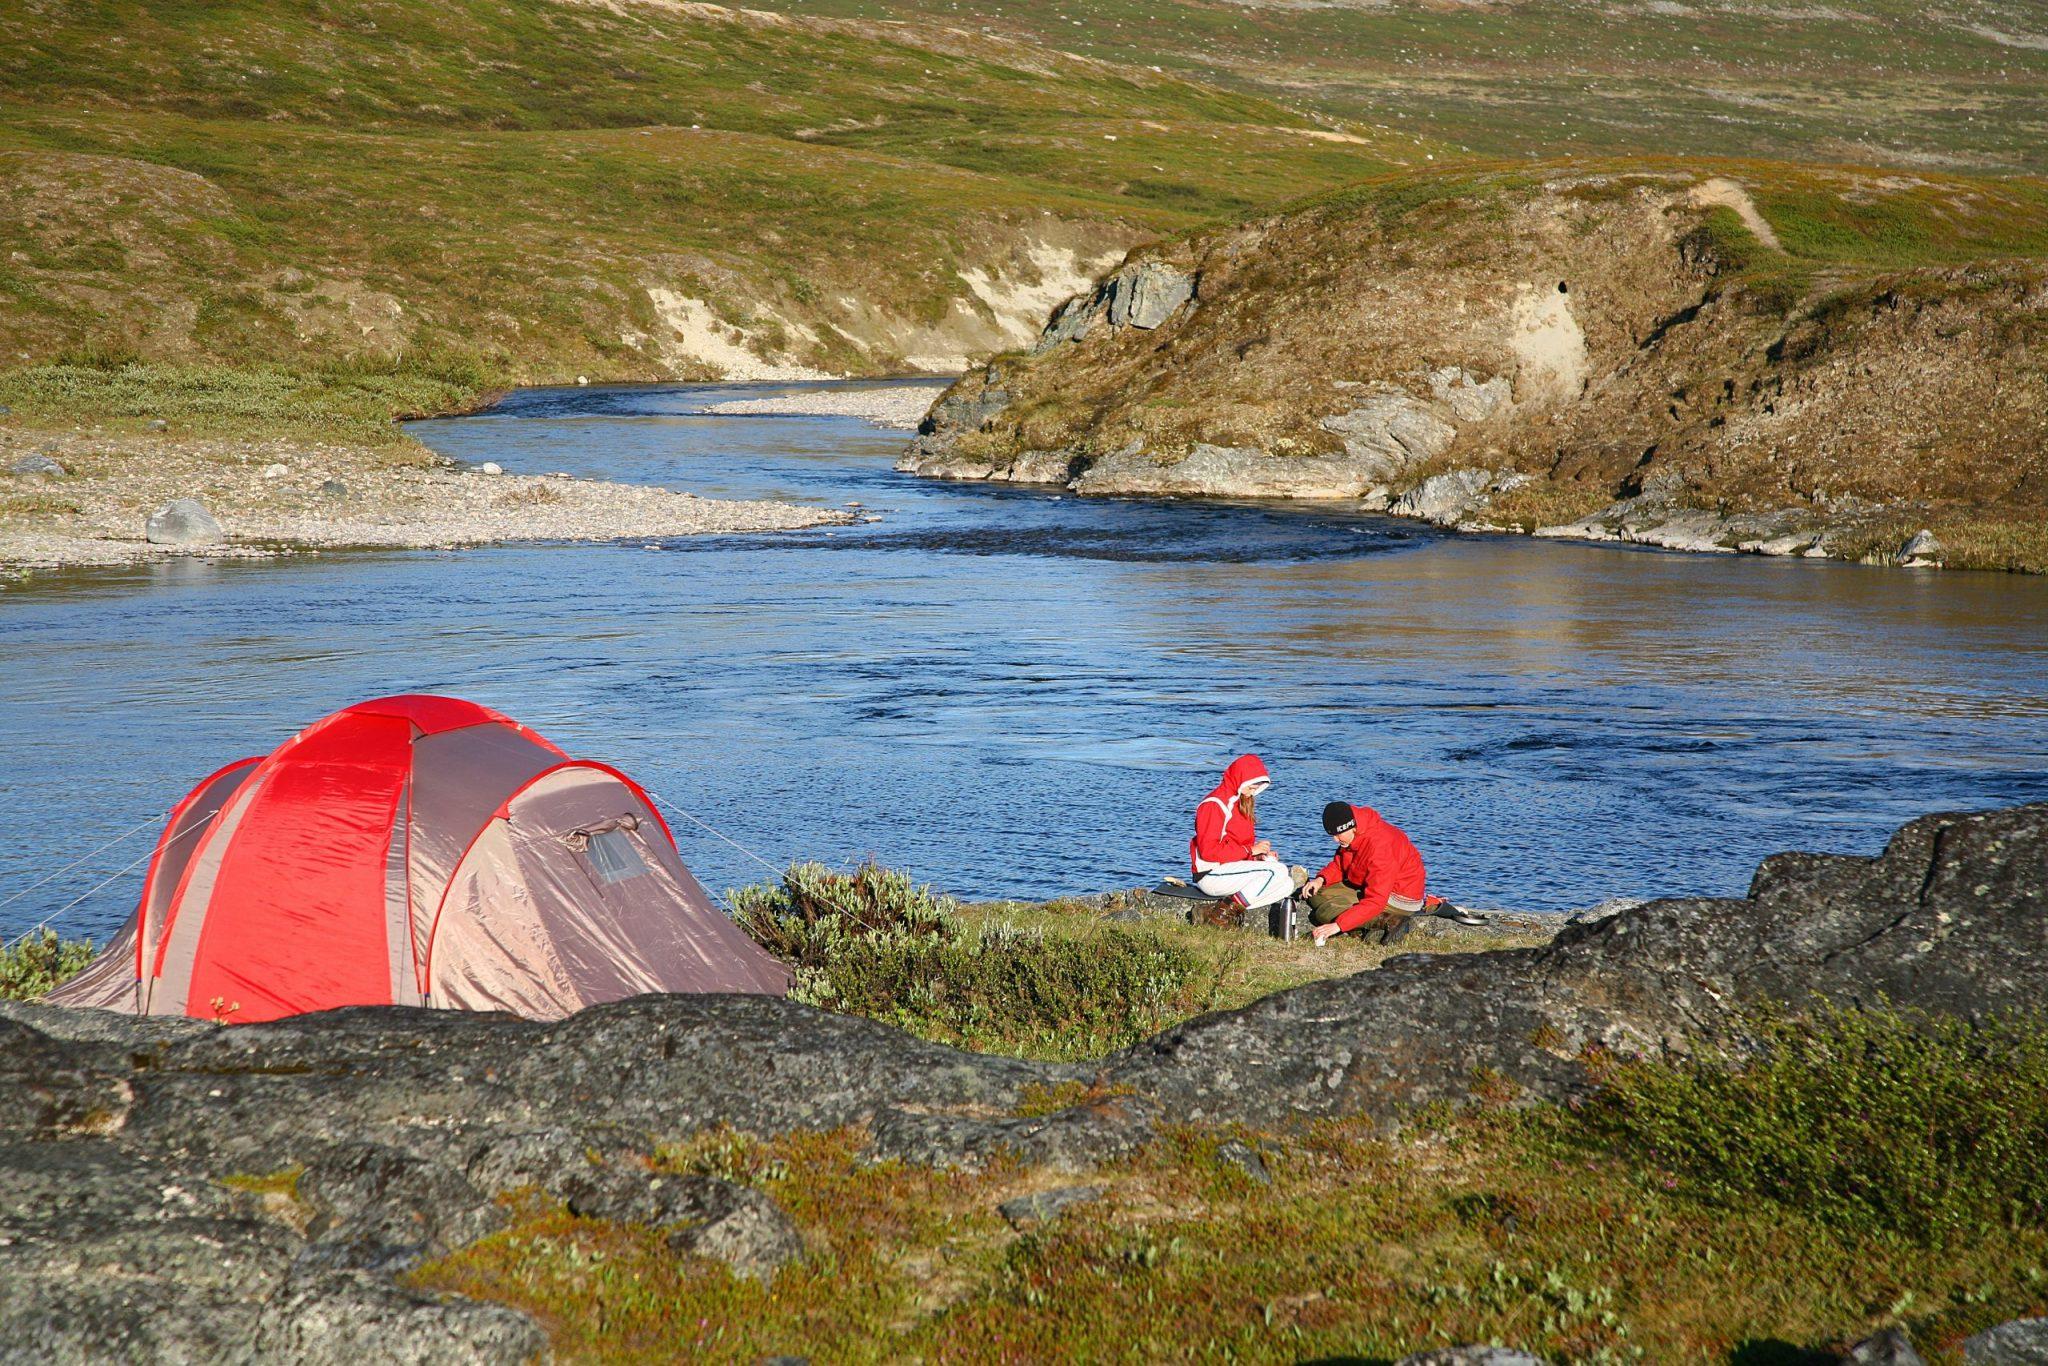 Camping DiscoverMuonio Activities Hiking Photo by Muonion matkailu Kouta Kuva Pauli Hänninen